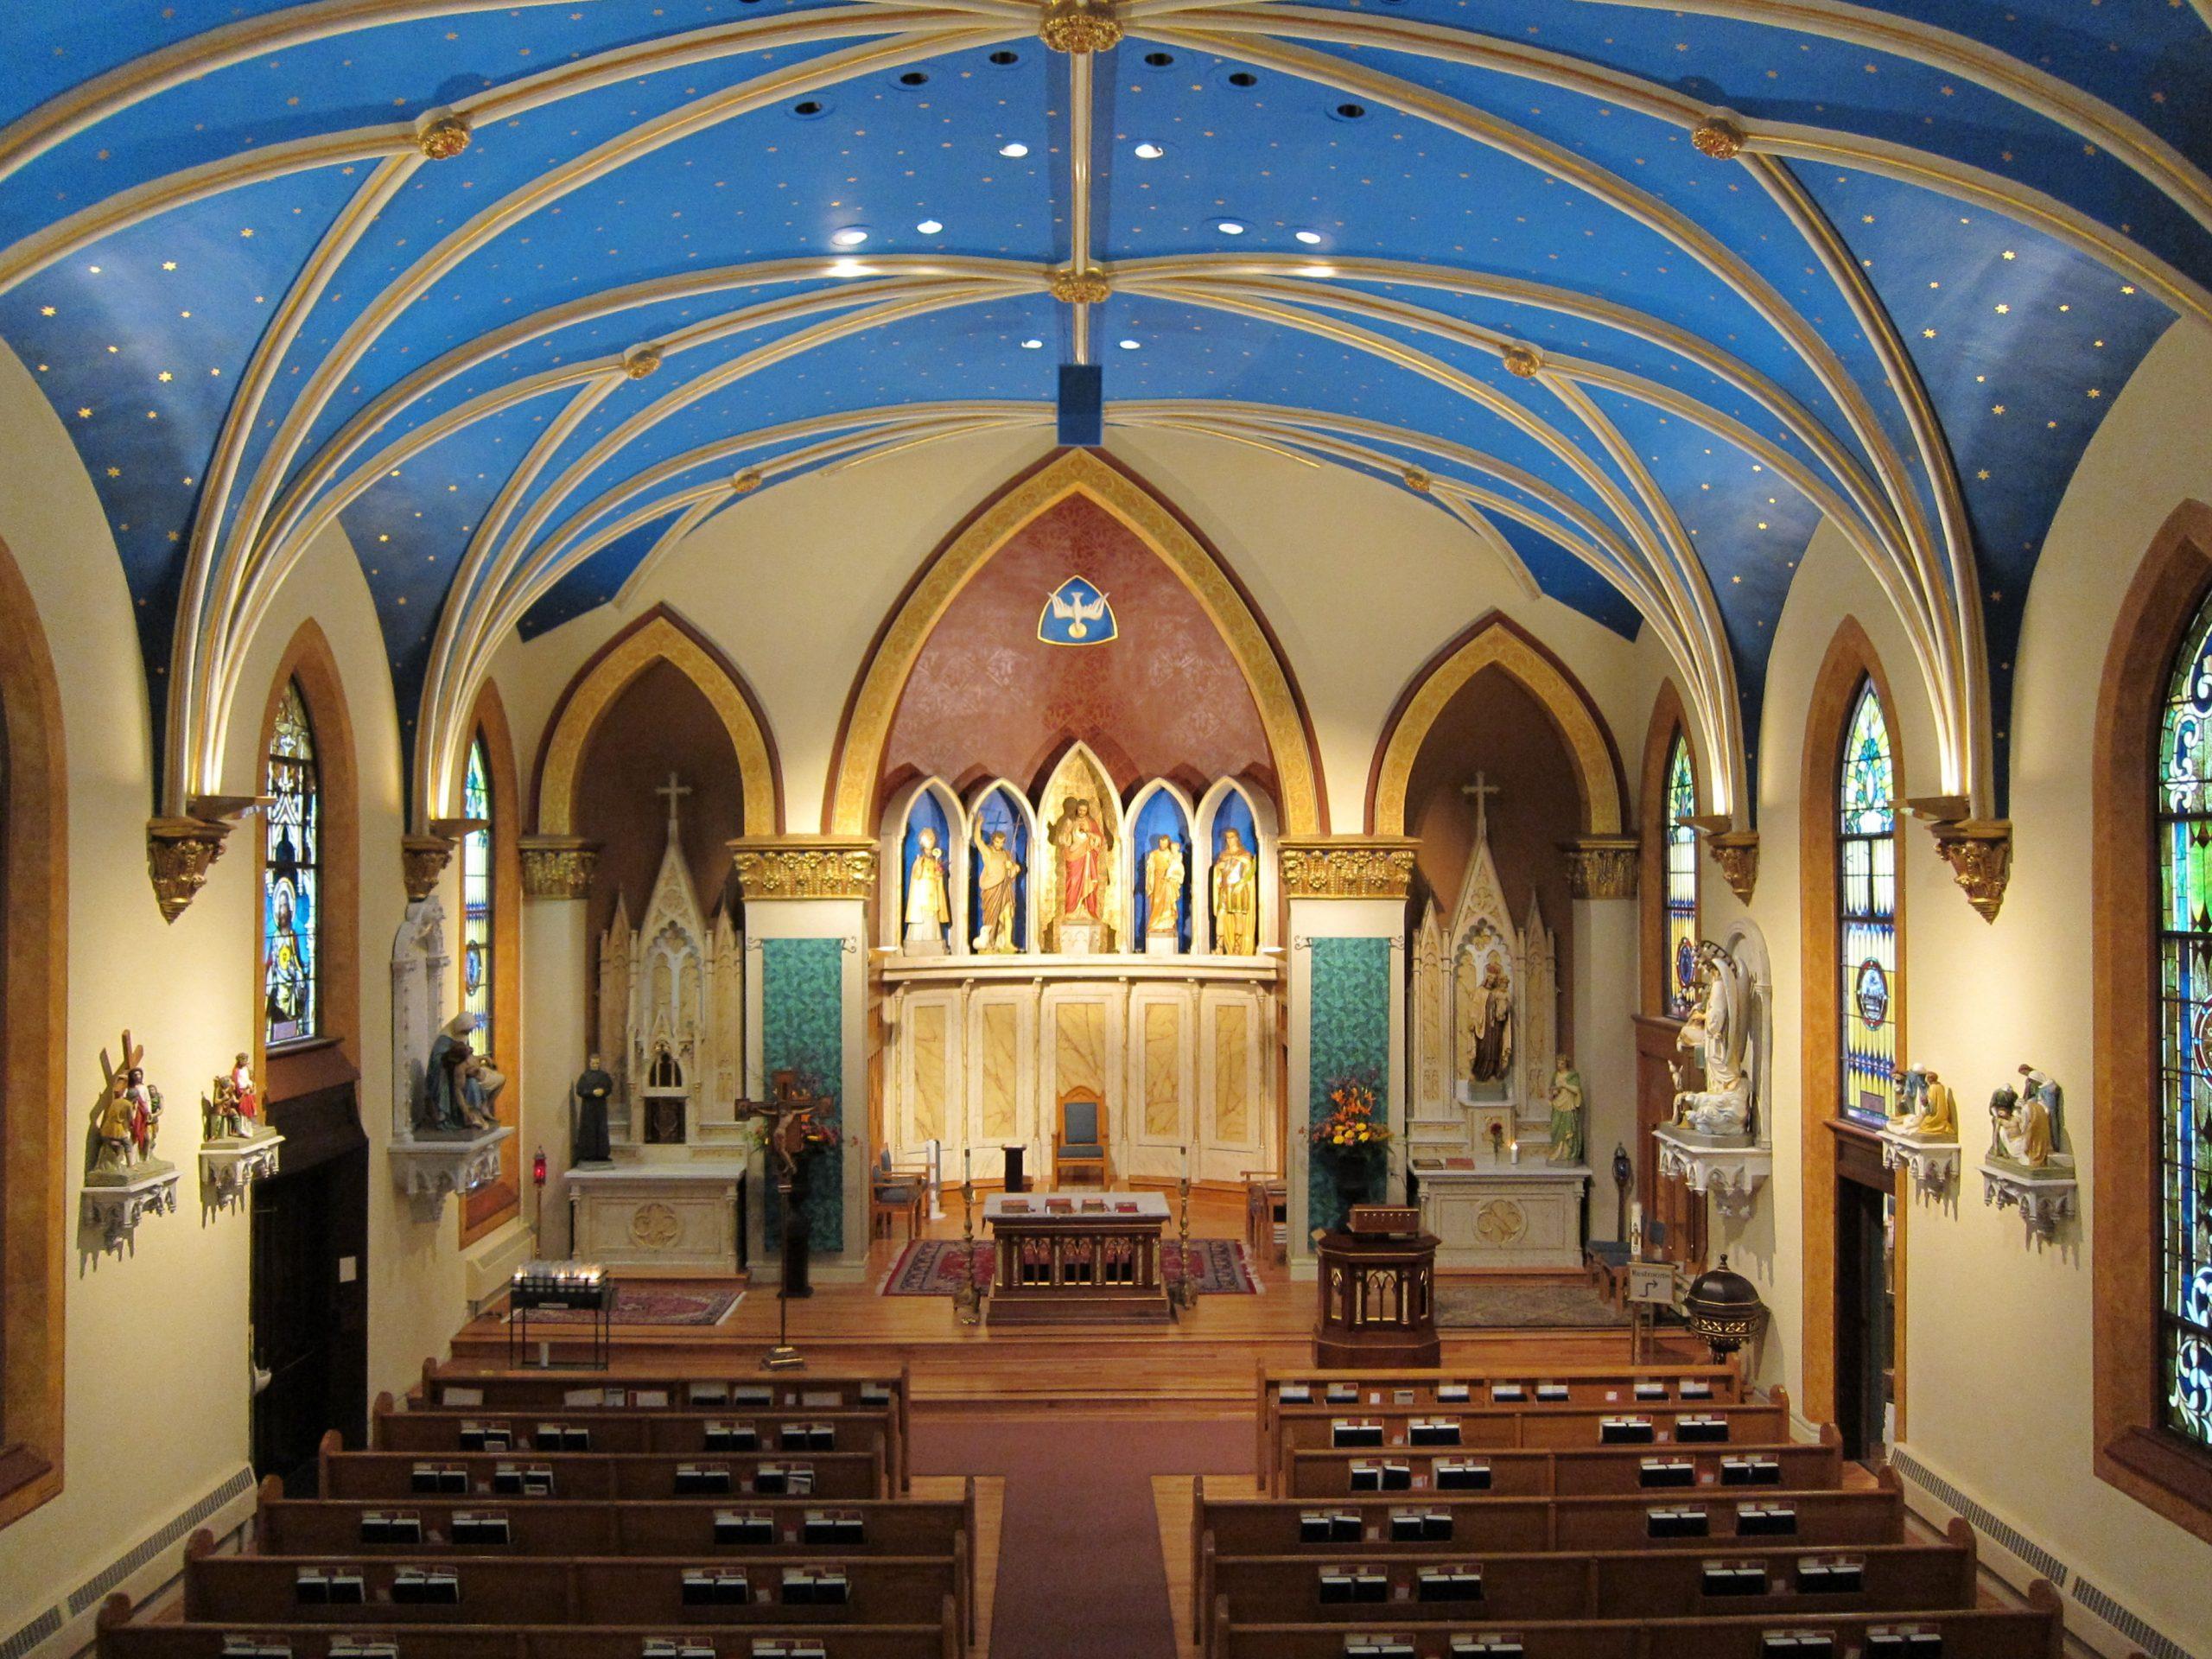 The Modern Legacy of St. John's Church